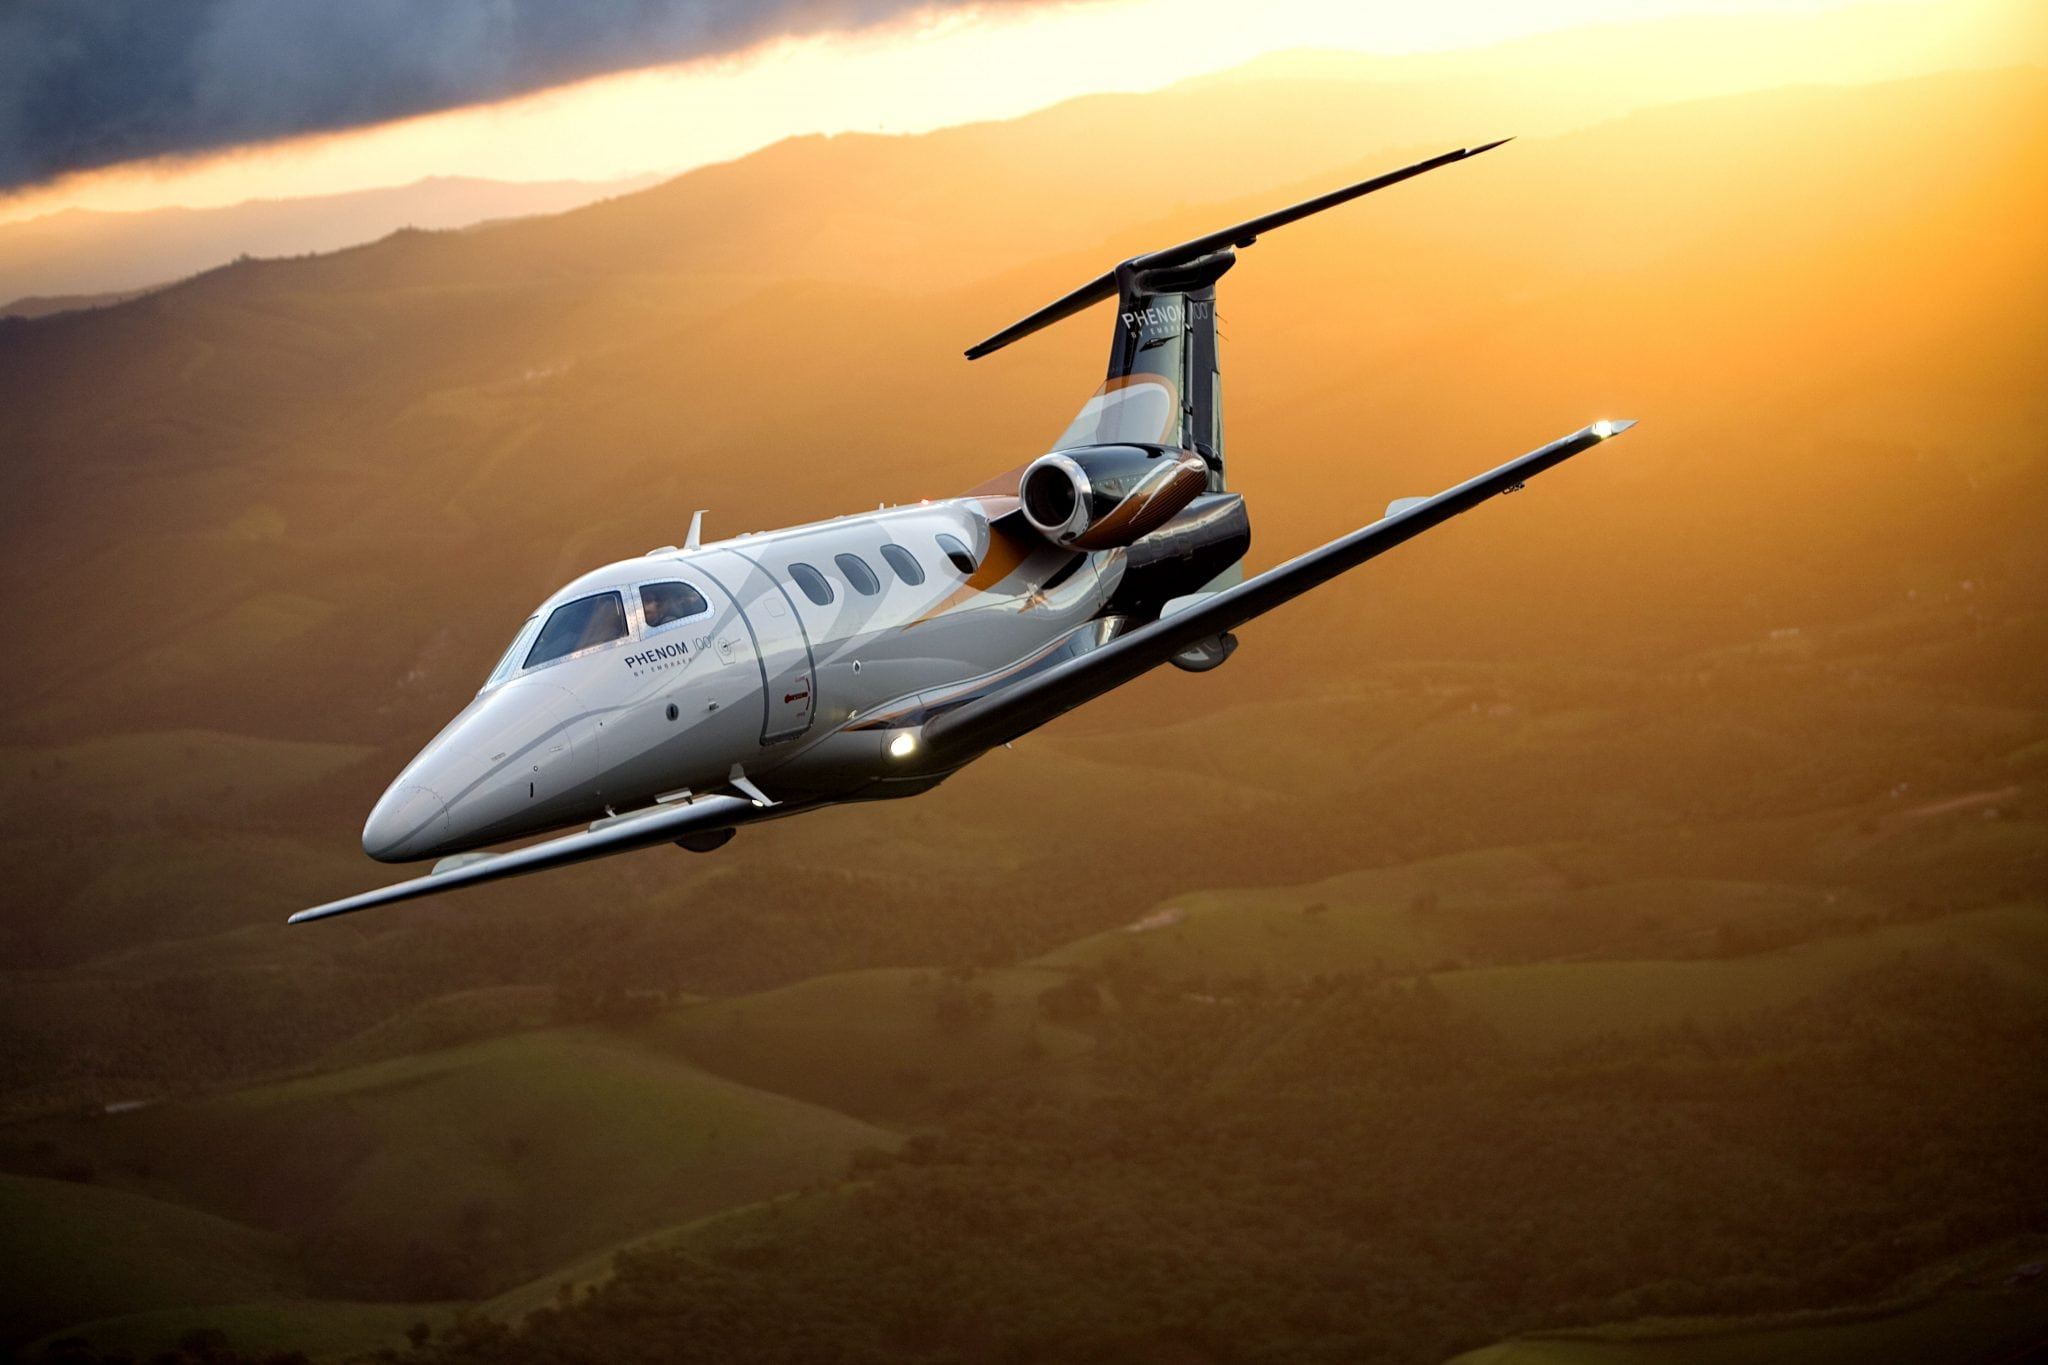 Embraer Phenom 100 business aviation jet